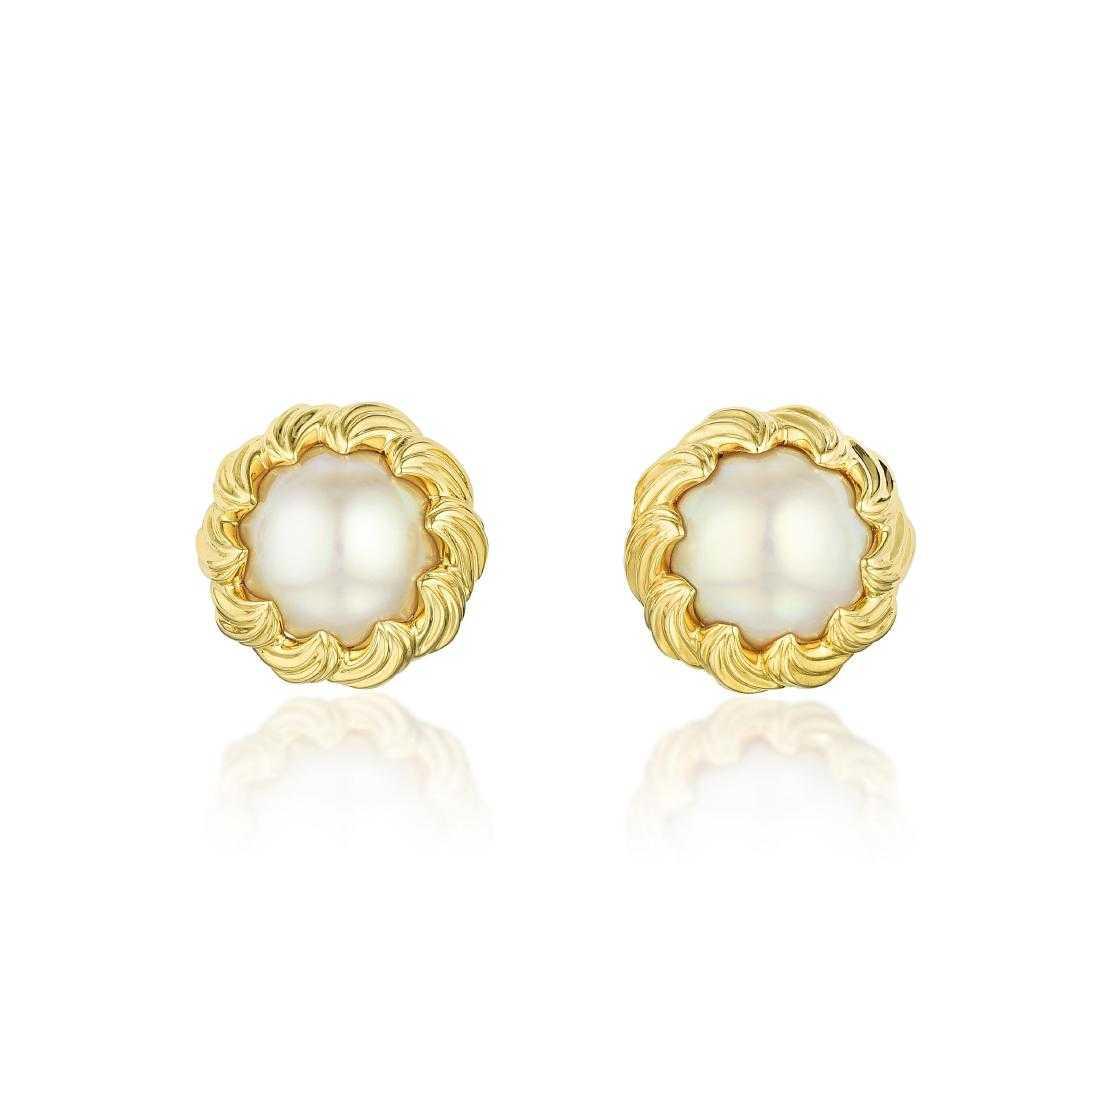 1d5f0ab0b Tiffany & Co. Mabe Pearl Earrings